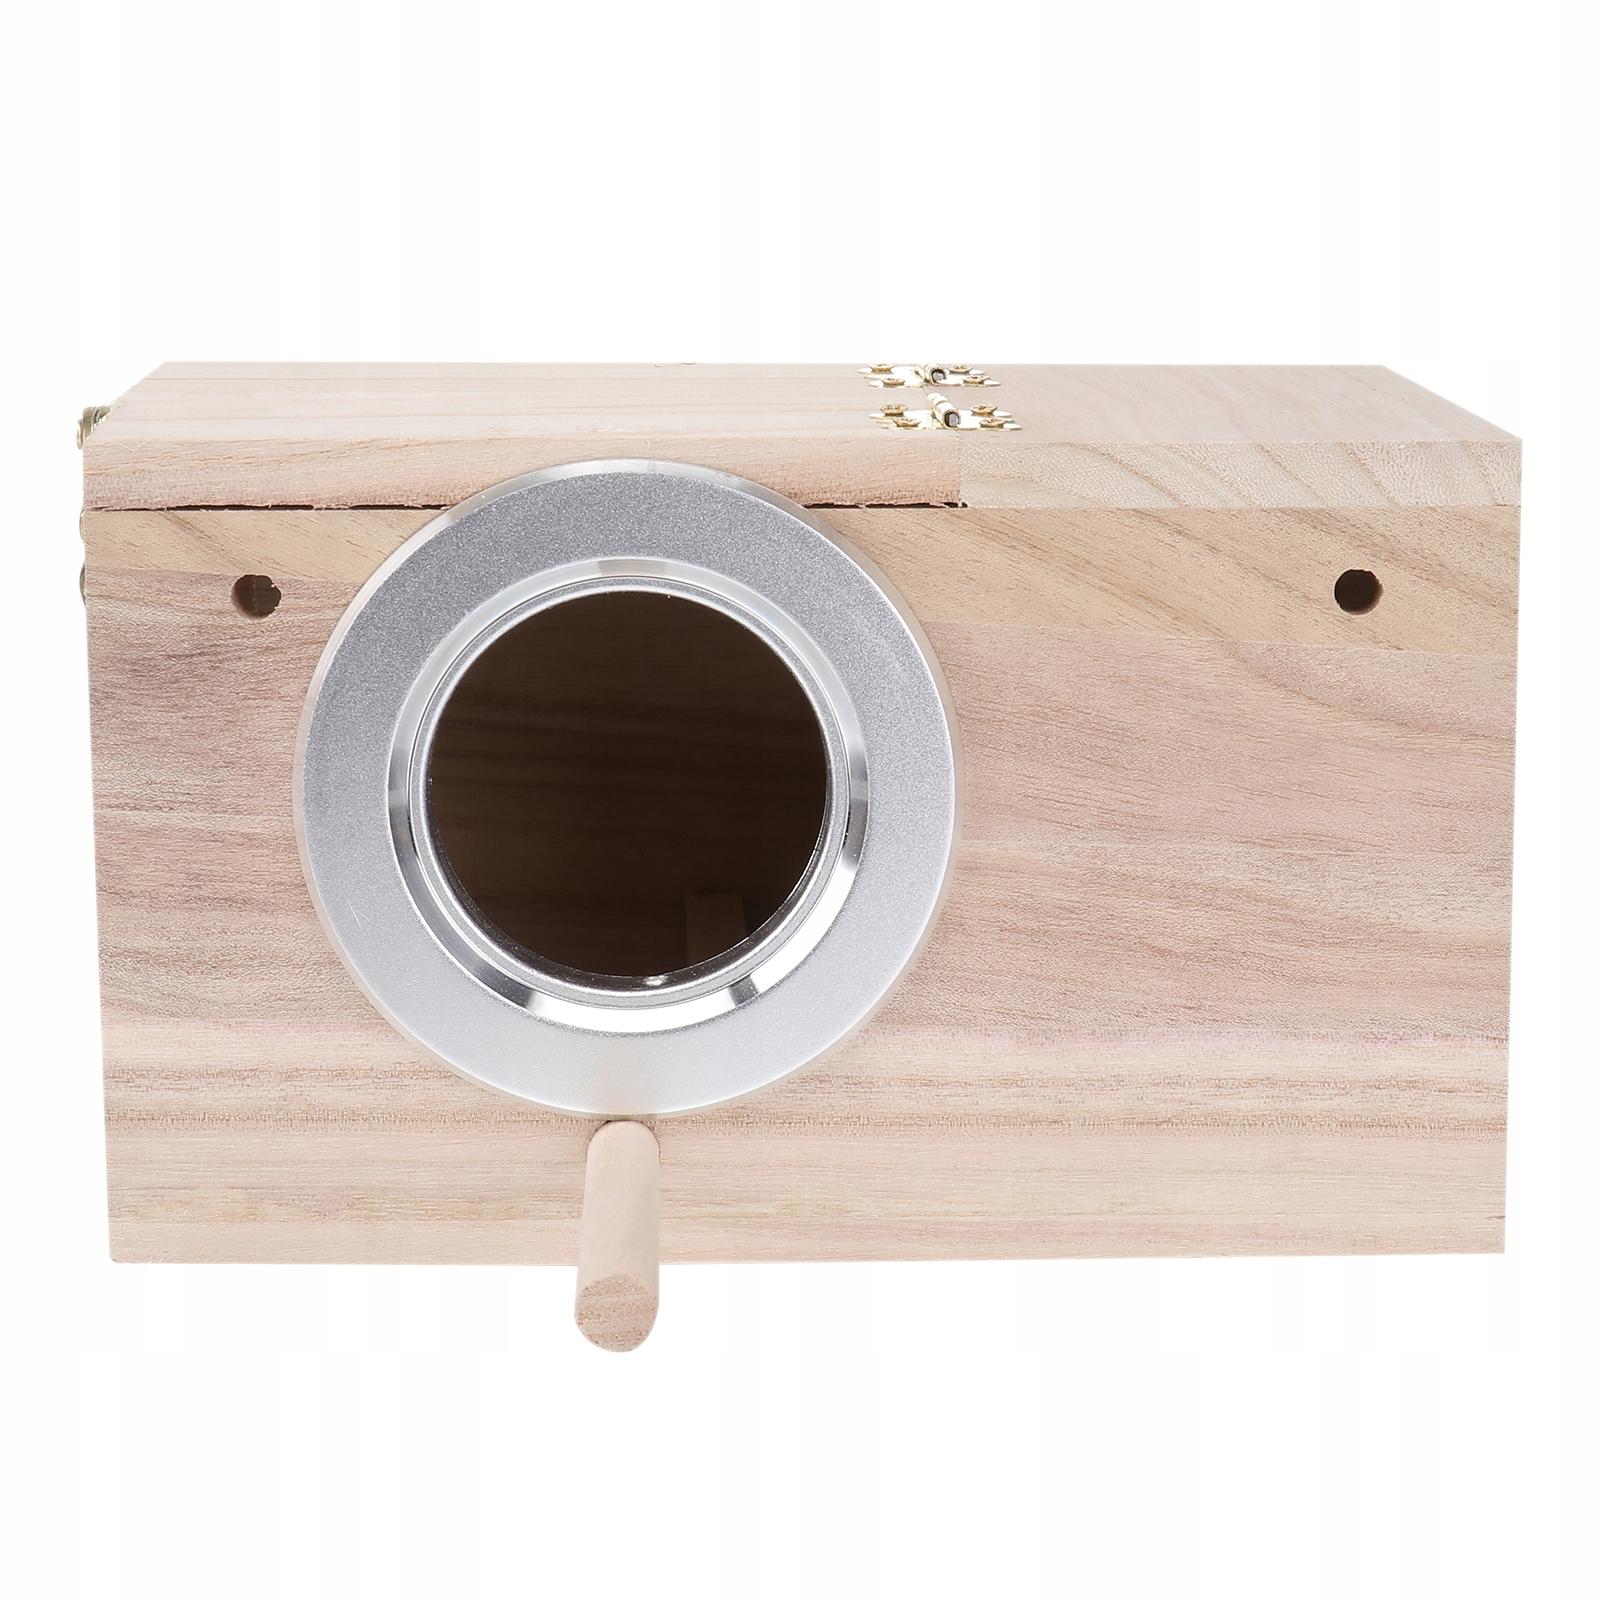 Подставка для попугаев для птиц Деревянный органайзер